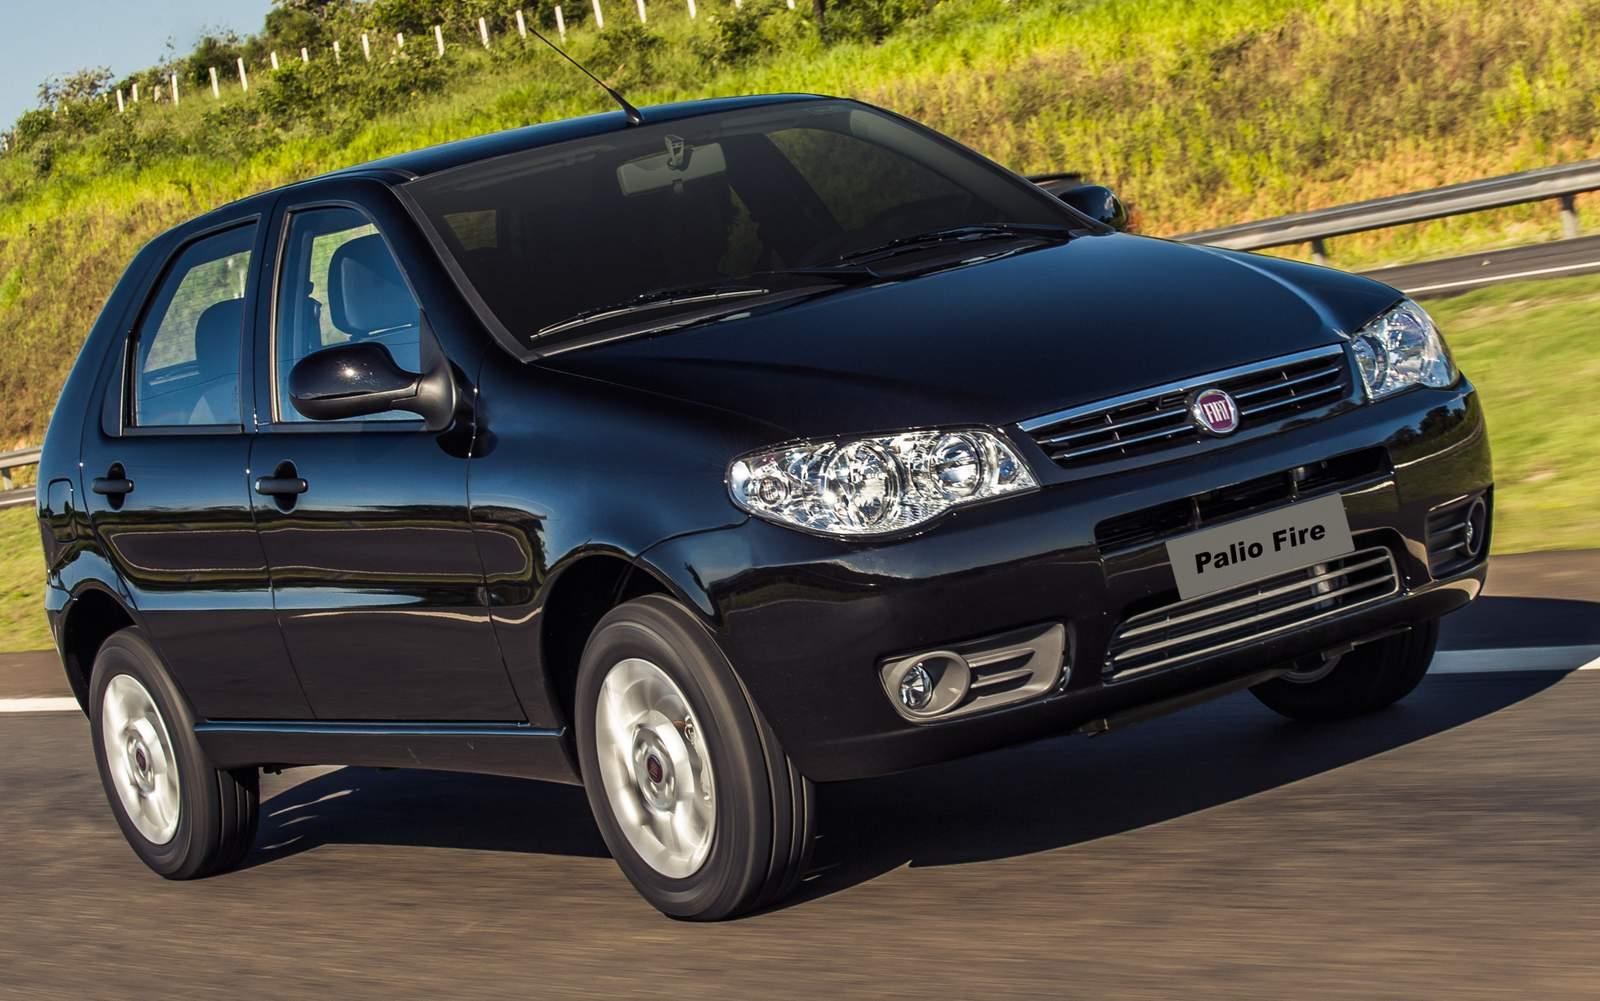 Fiat mantém a liderança no ranking dos automóveis em 2014